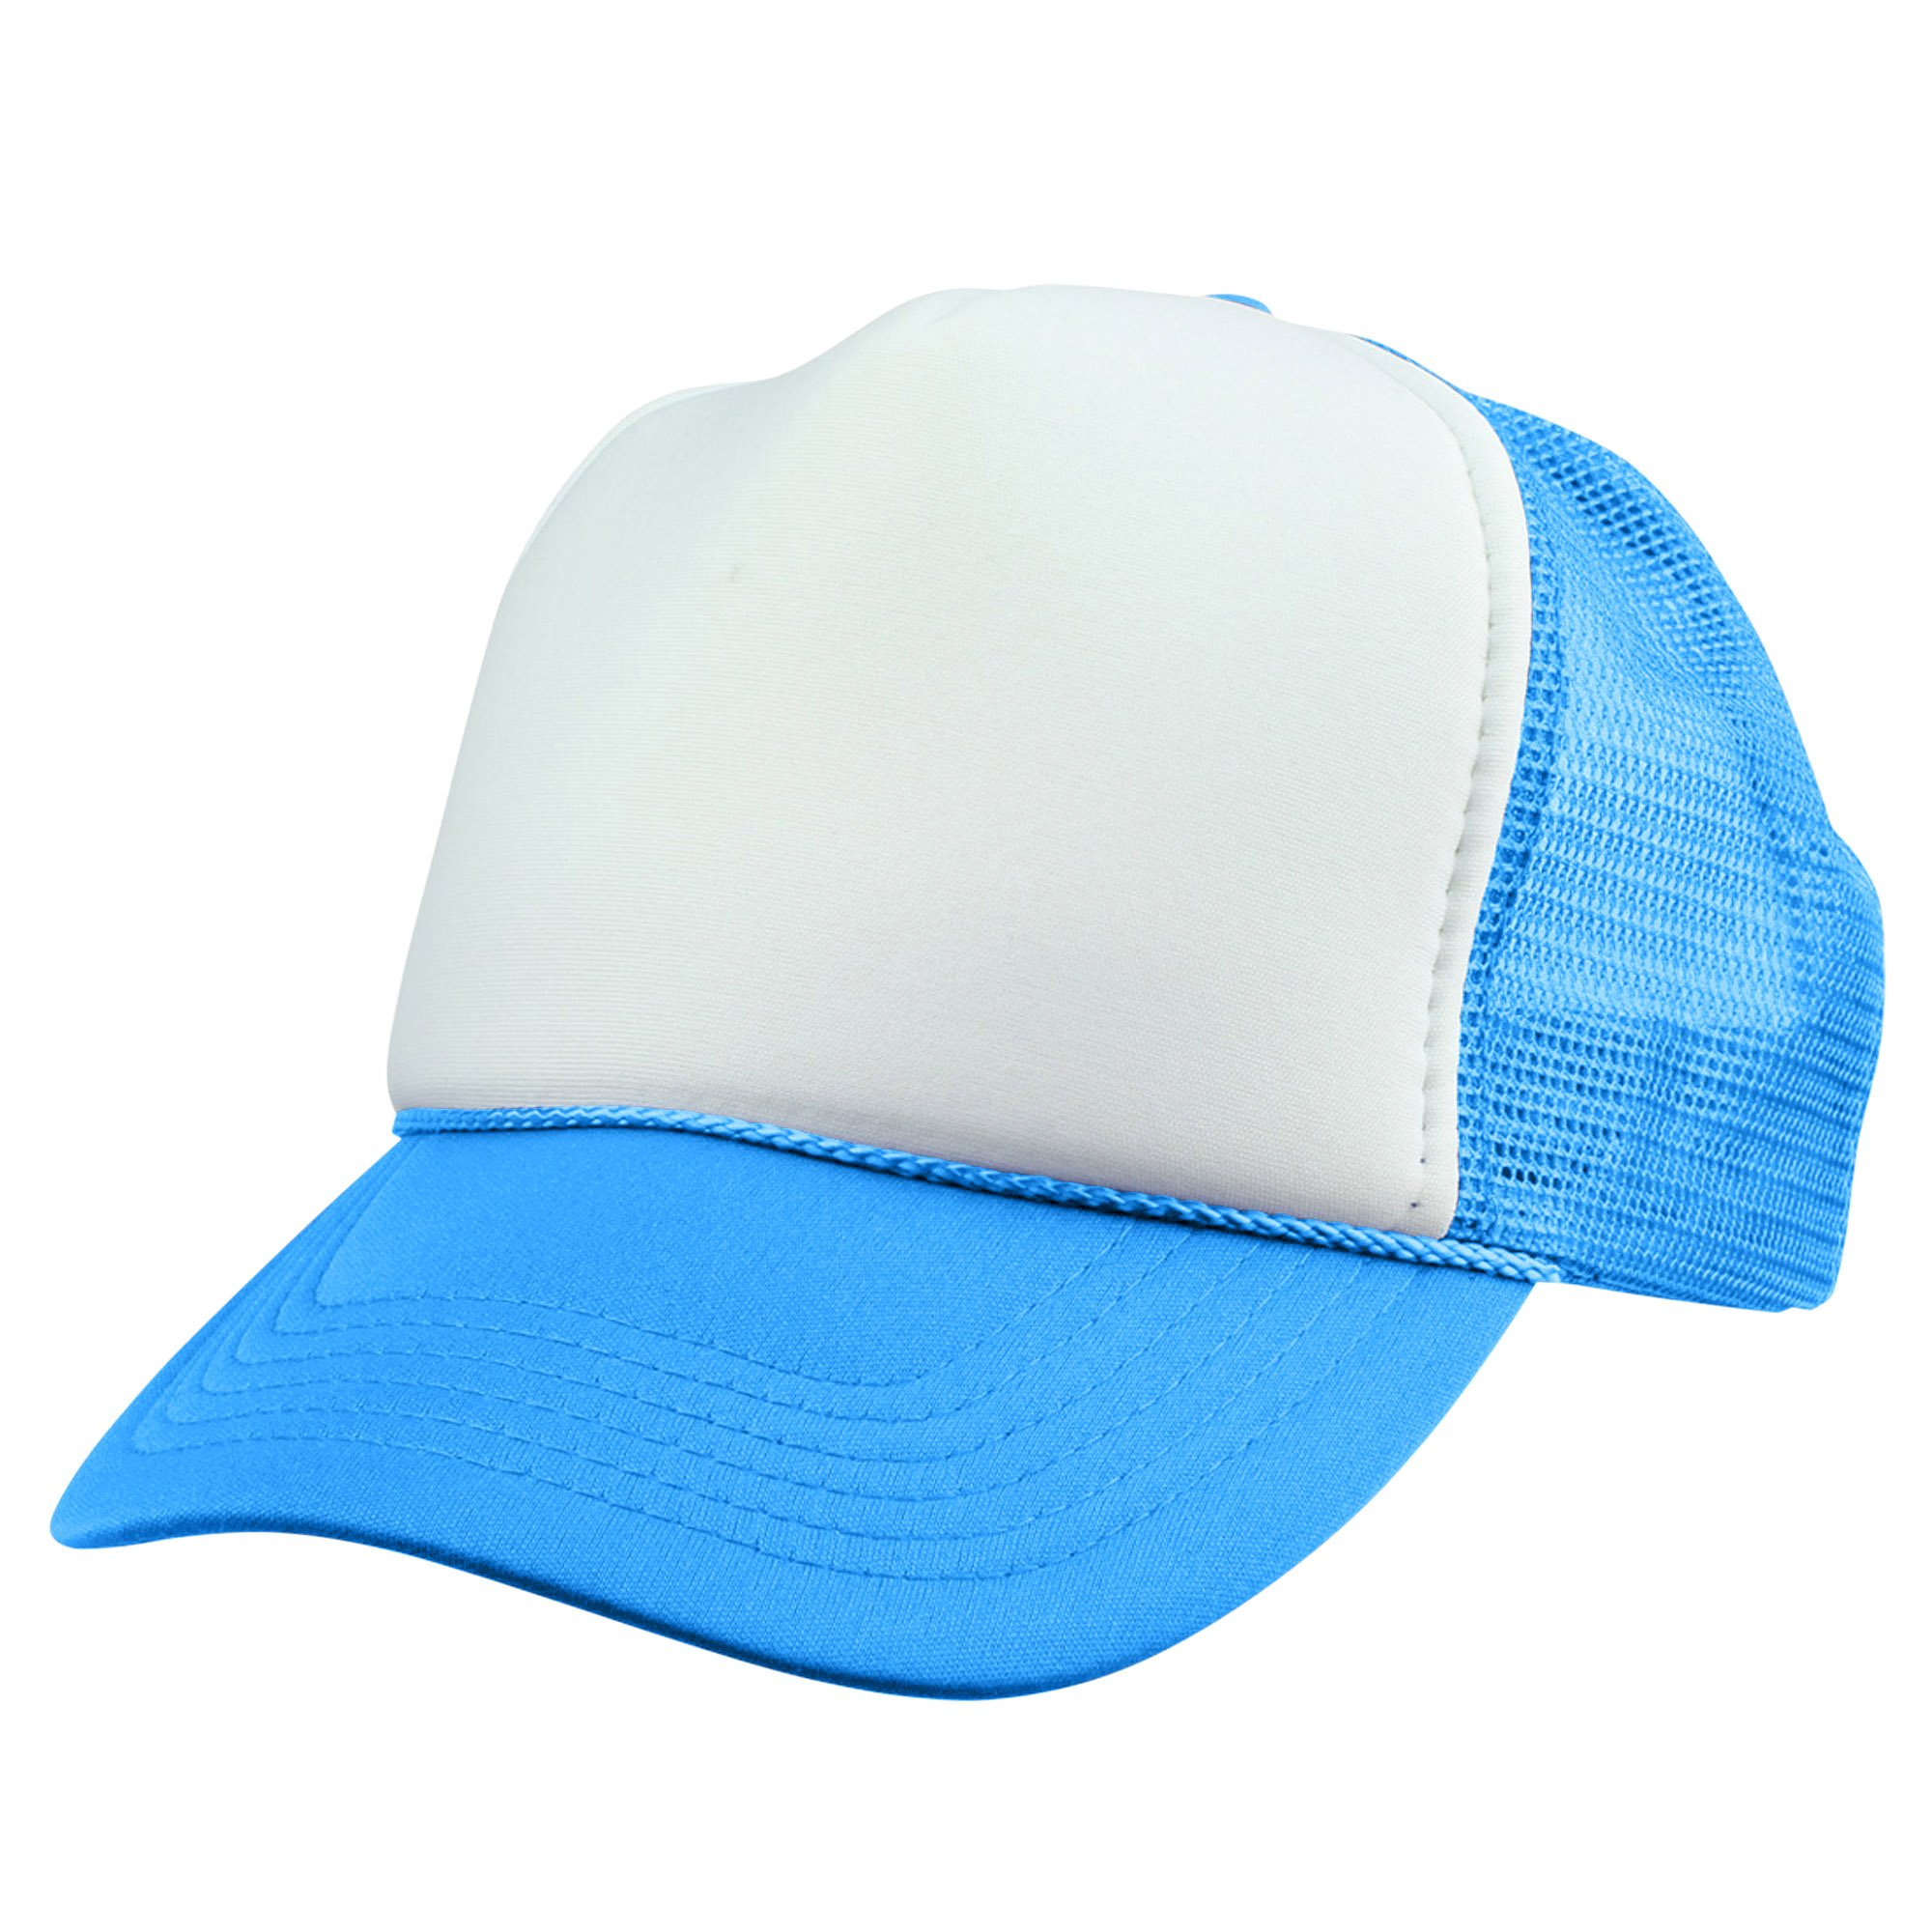 2129f2026 DALIX Trucker Cap Neon Blue Hat for Boys Youth Baseball Caps Small Head  Sizes